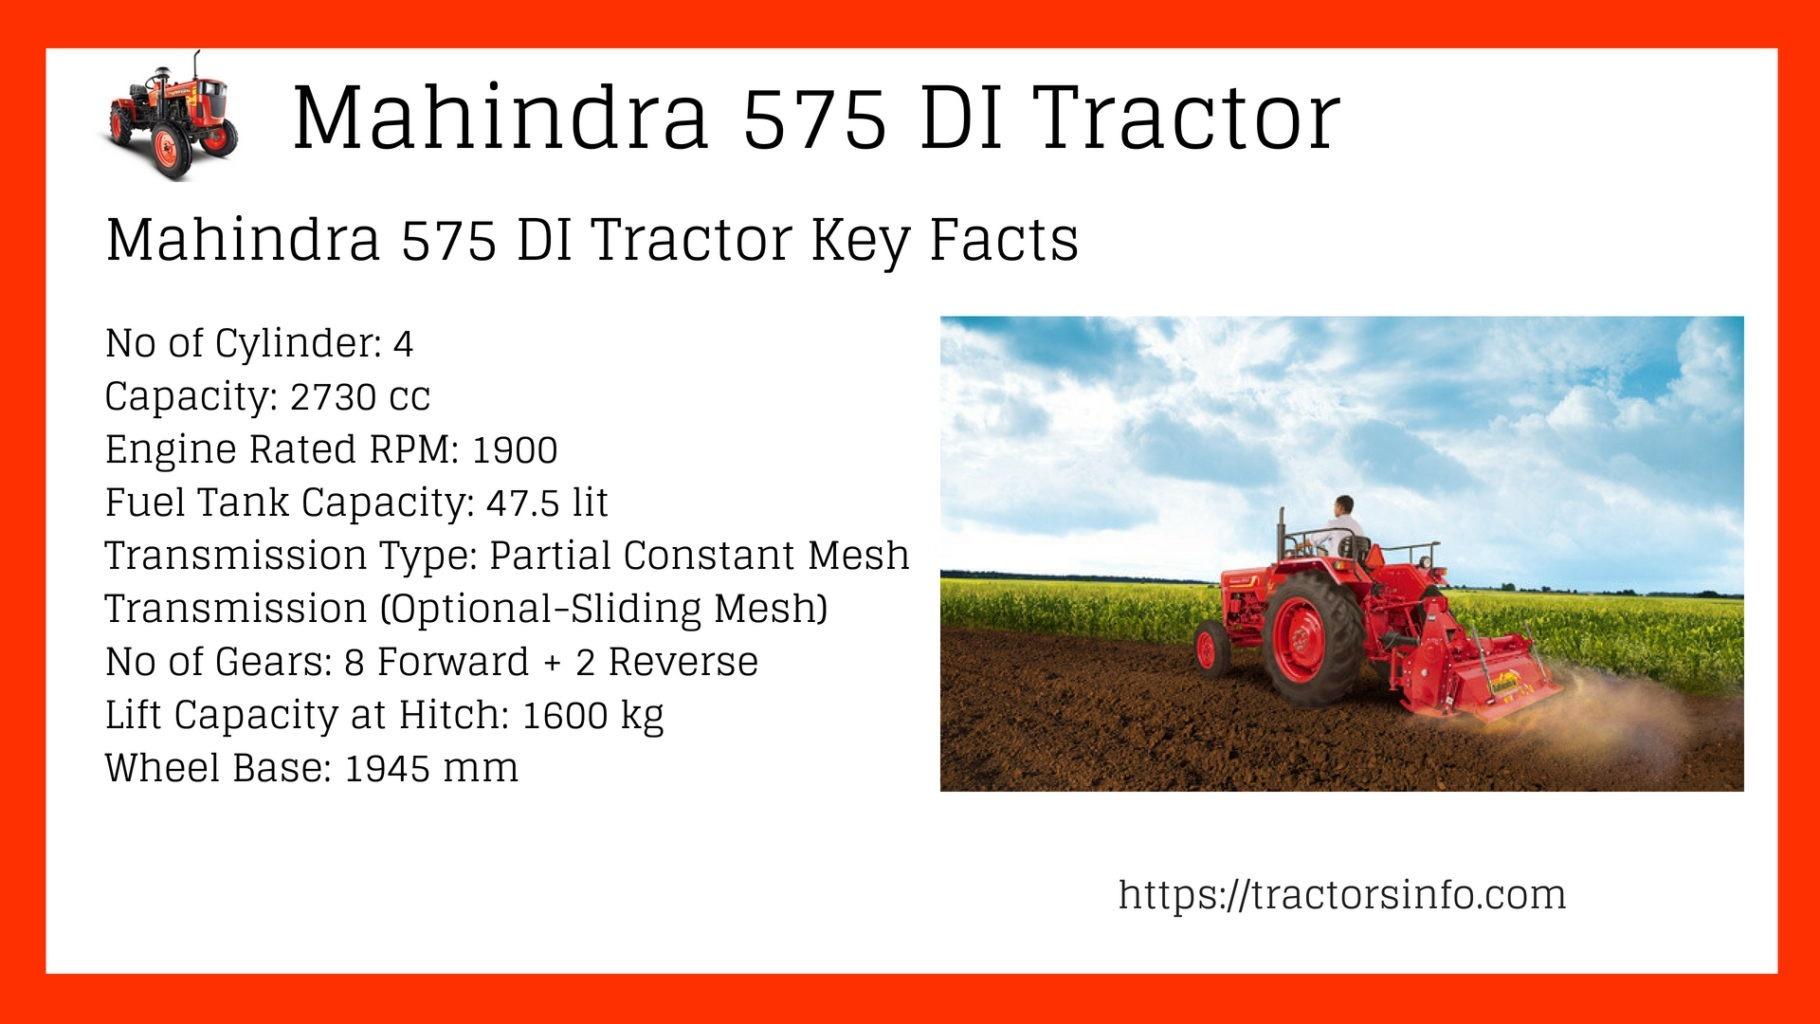 Mahindra-575-DI-Tractor